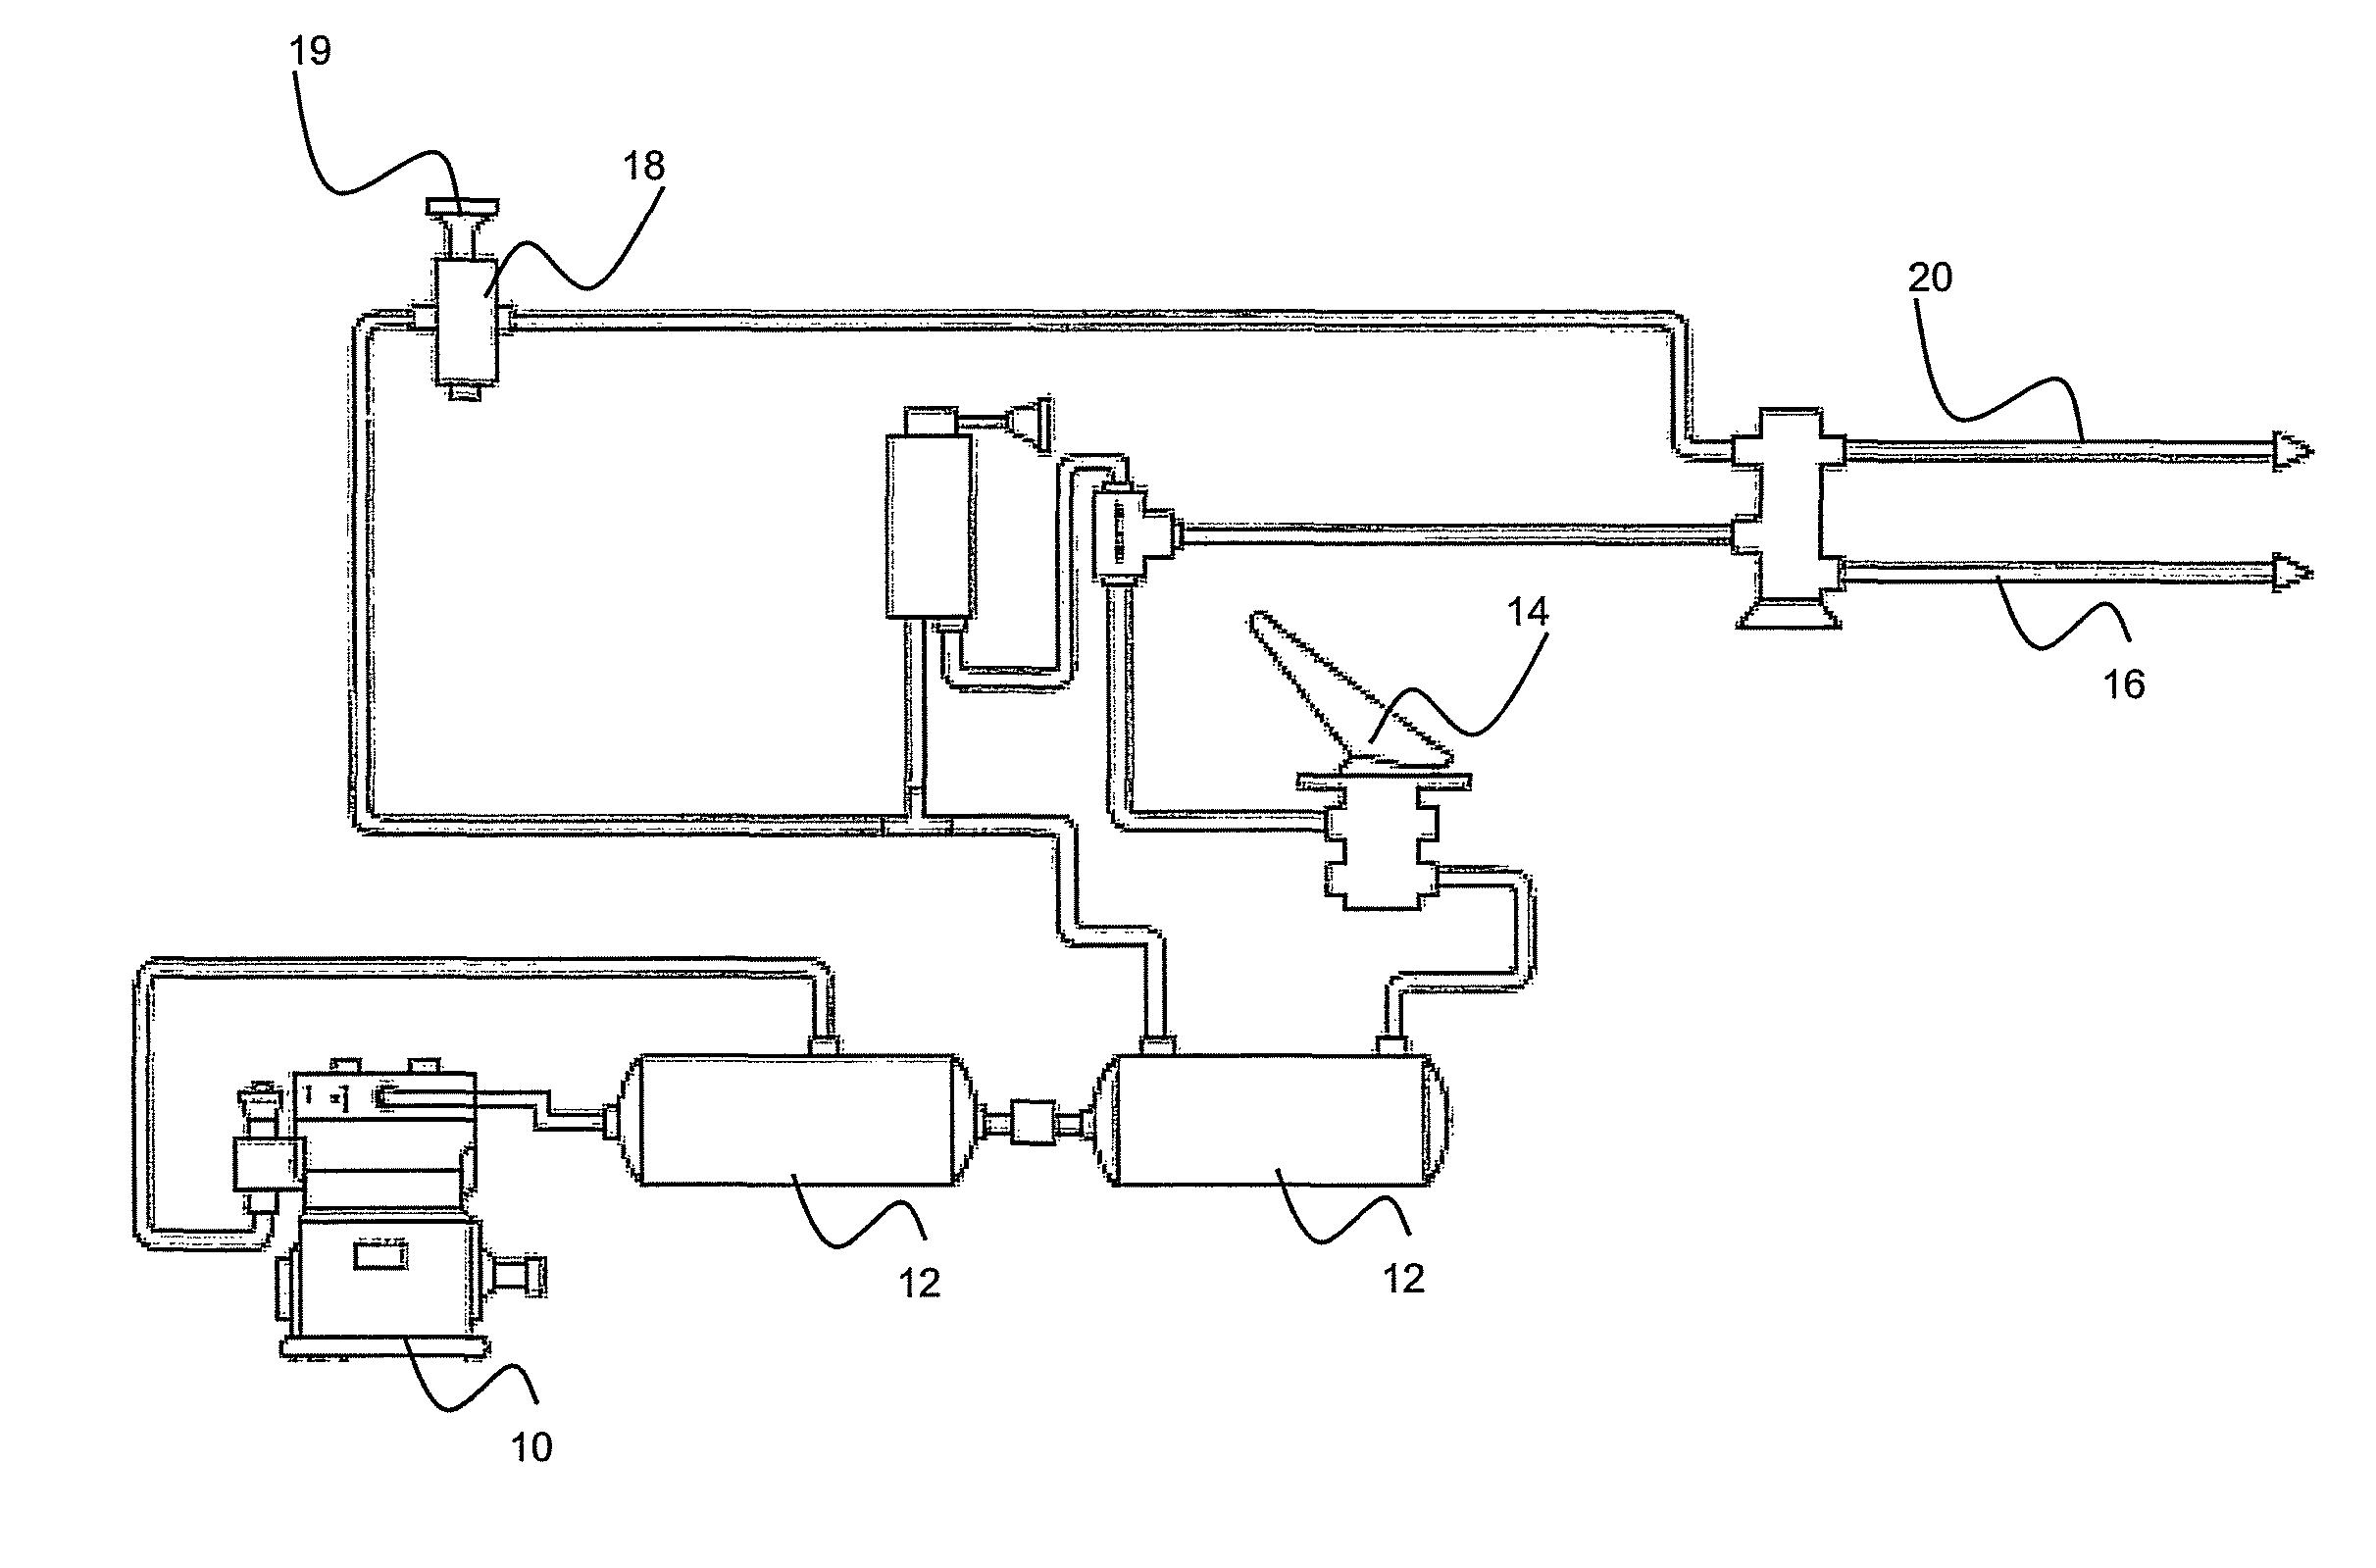 Patent Us8249789 Spring Brake Valve Google Patents Air Brakes Schematic Drawing